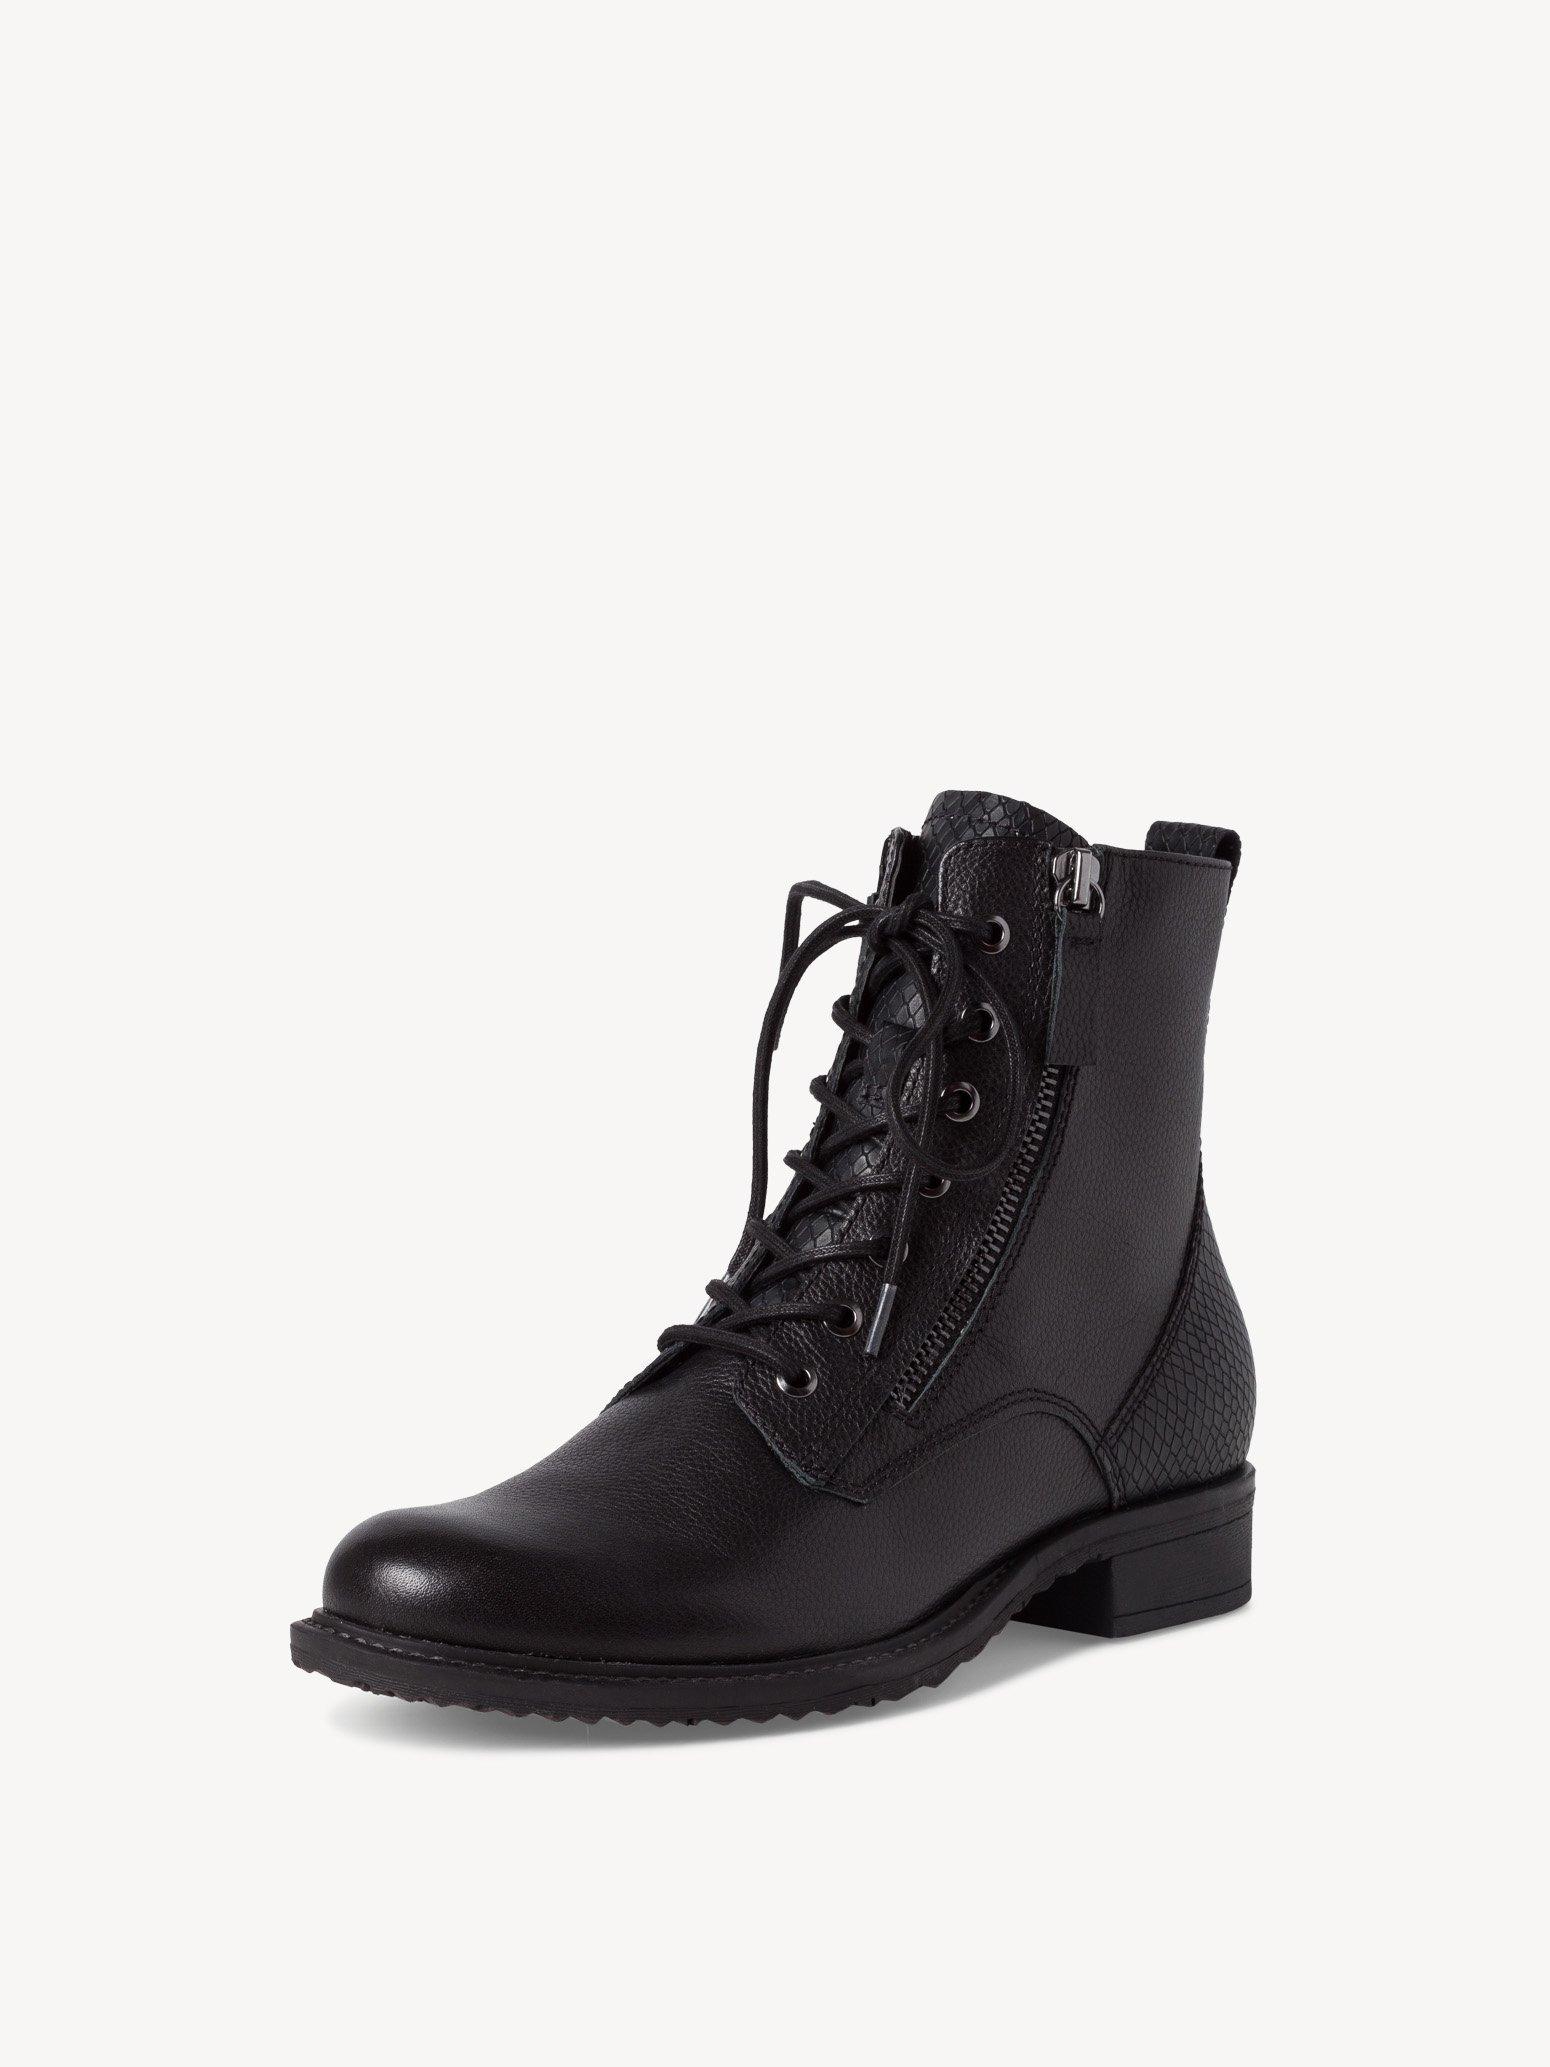 Ботинки Tamaris 1-1-25211-27-074